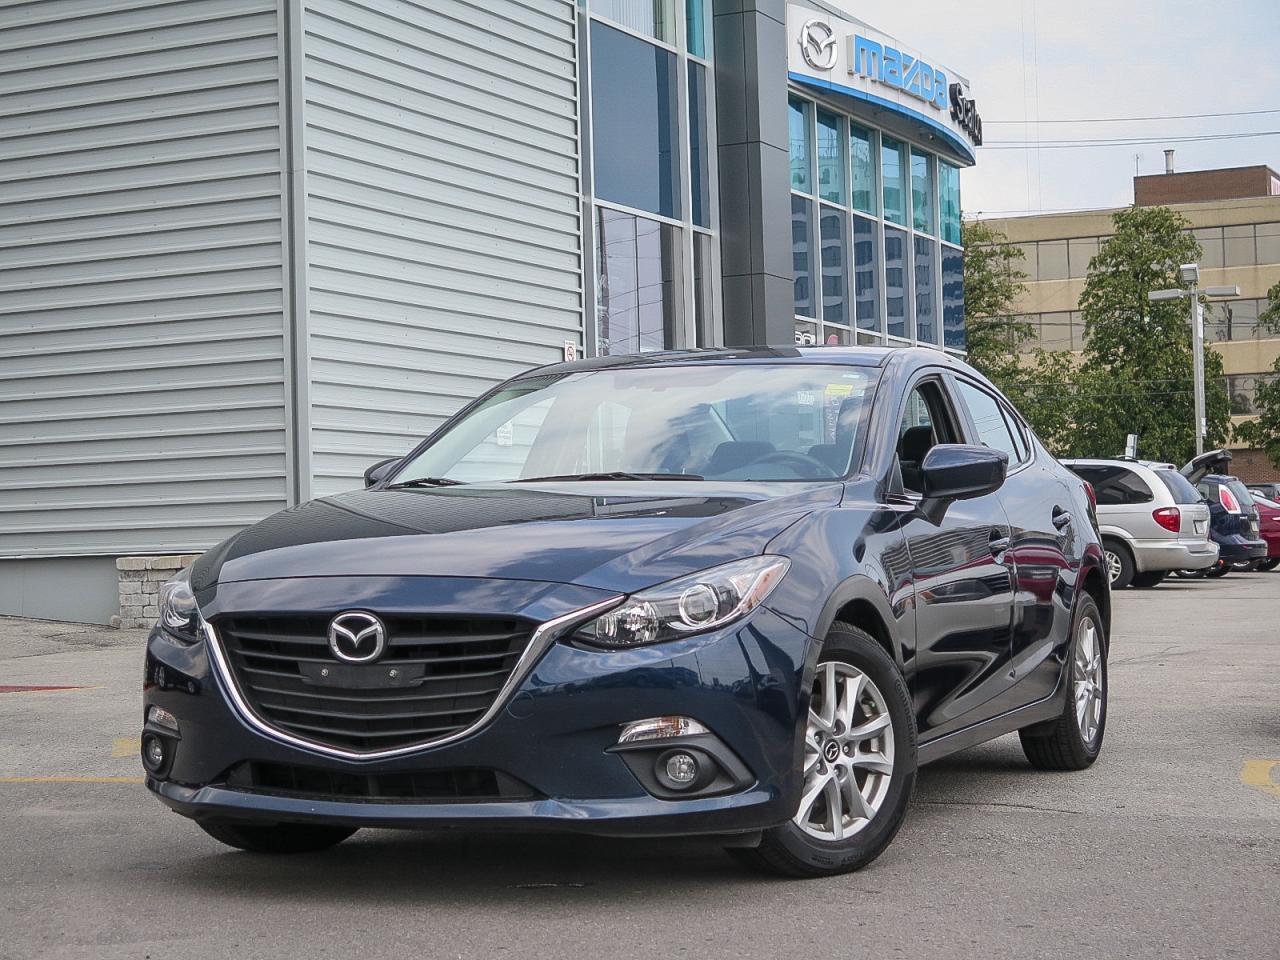 2014 Mazda MAZDA3 GS MOON ROOF 0.9% FINANCE!!!